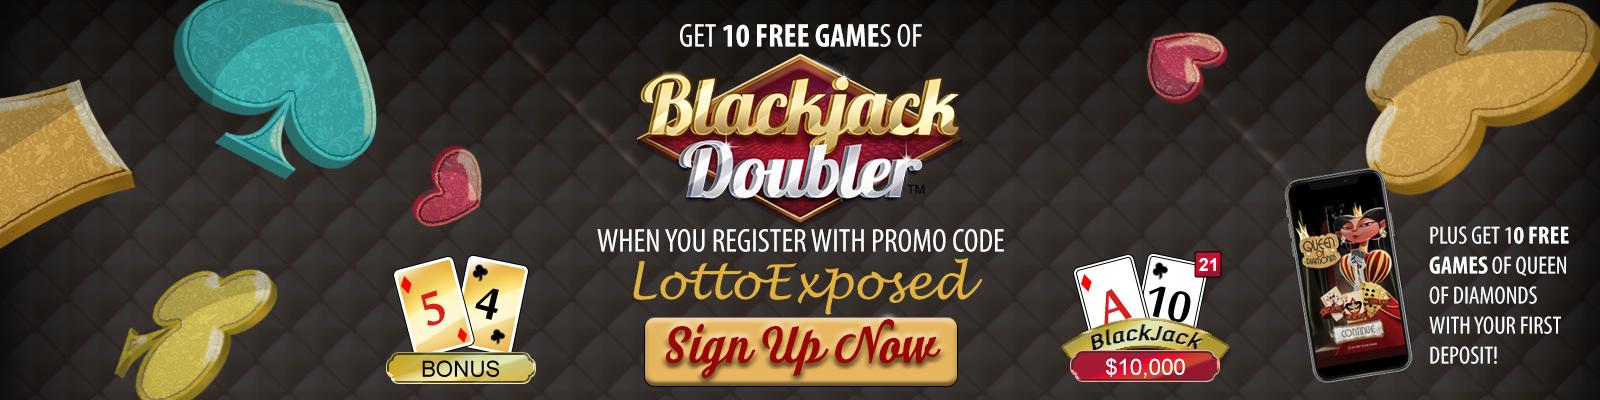 Use LottoExposed promo code